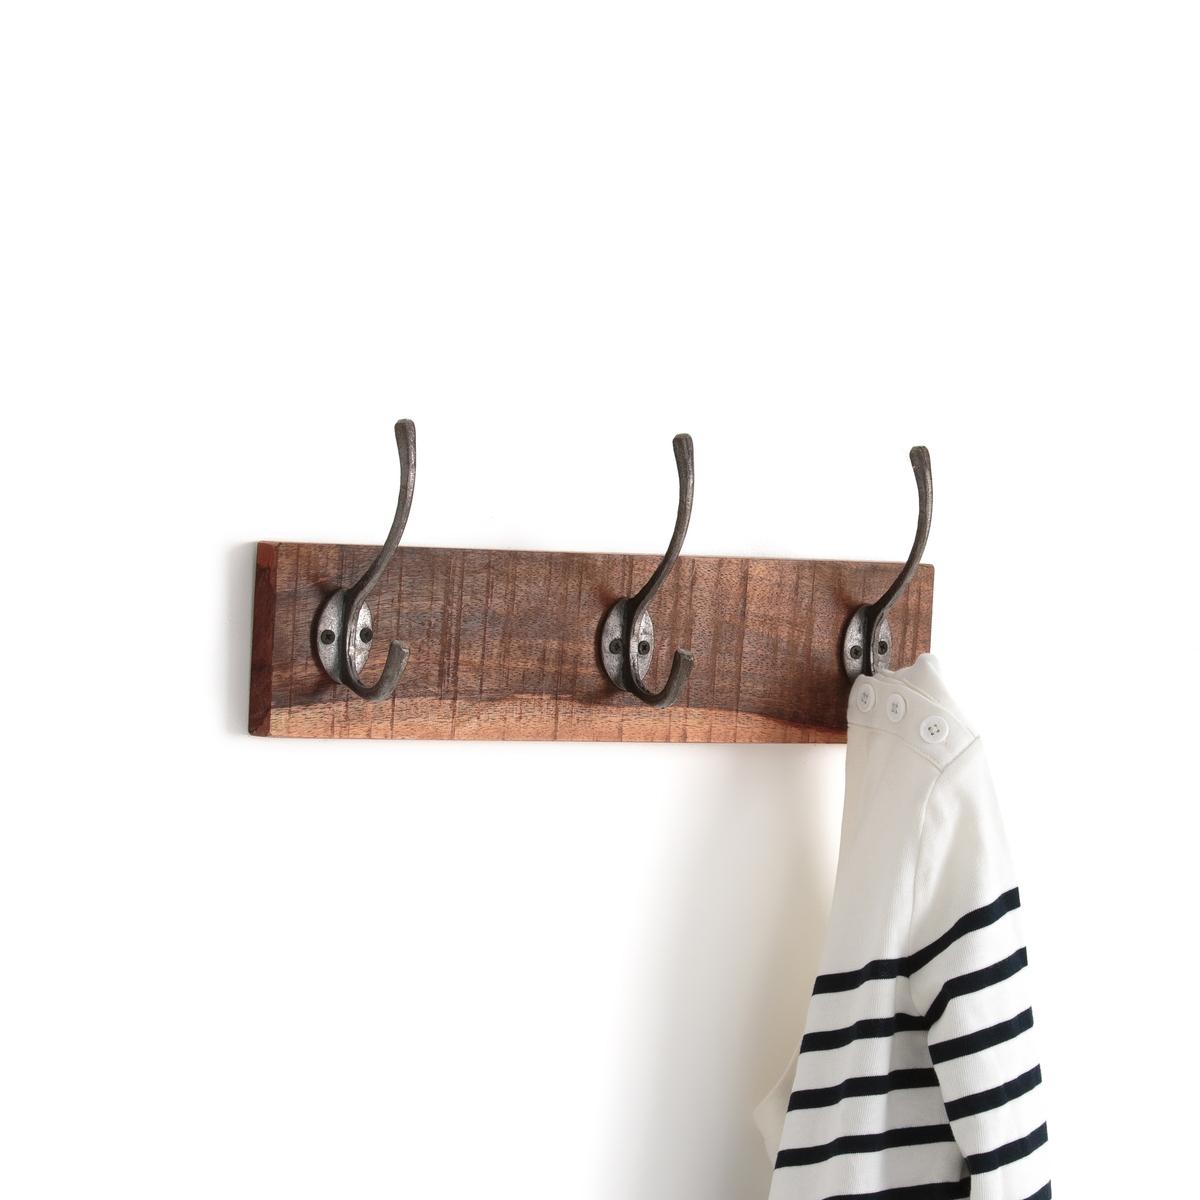 Вешалка с 3 крючками для крепления на стене